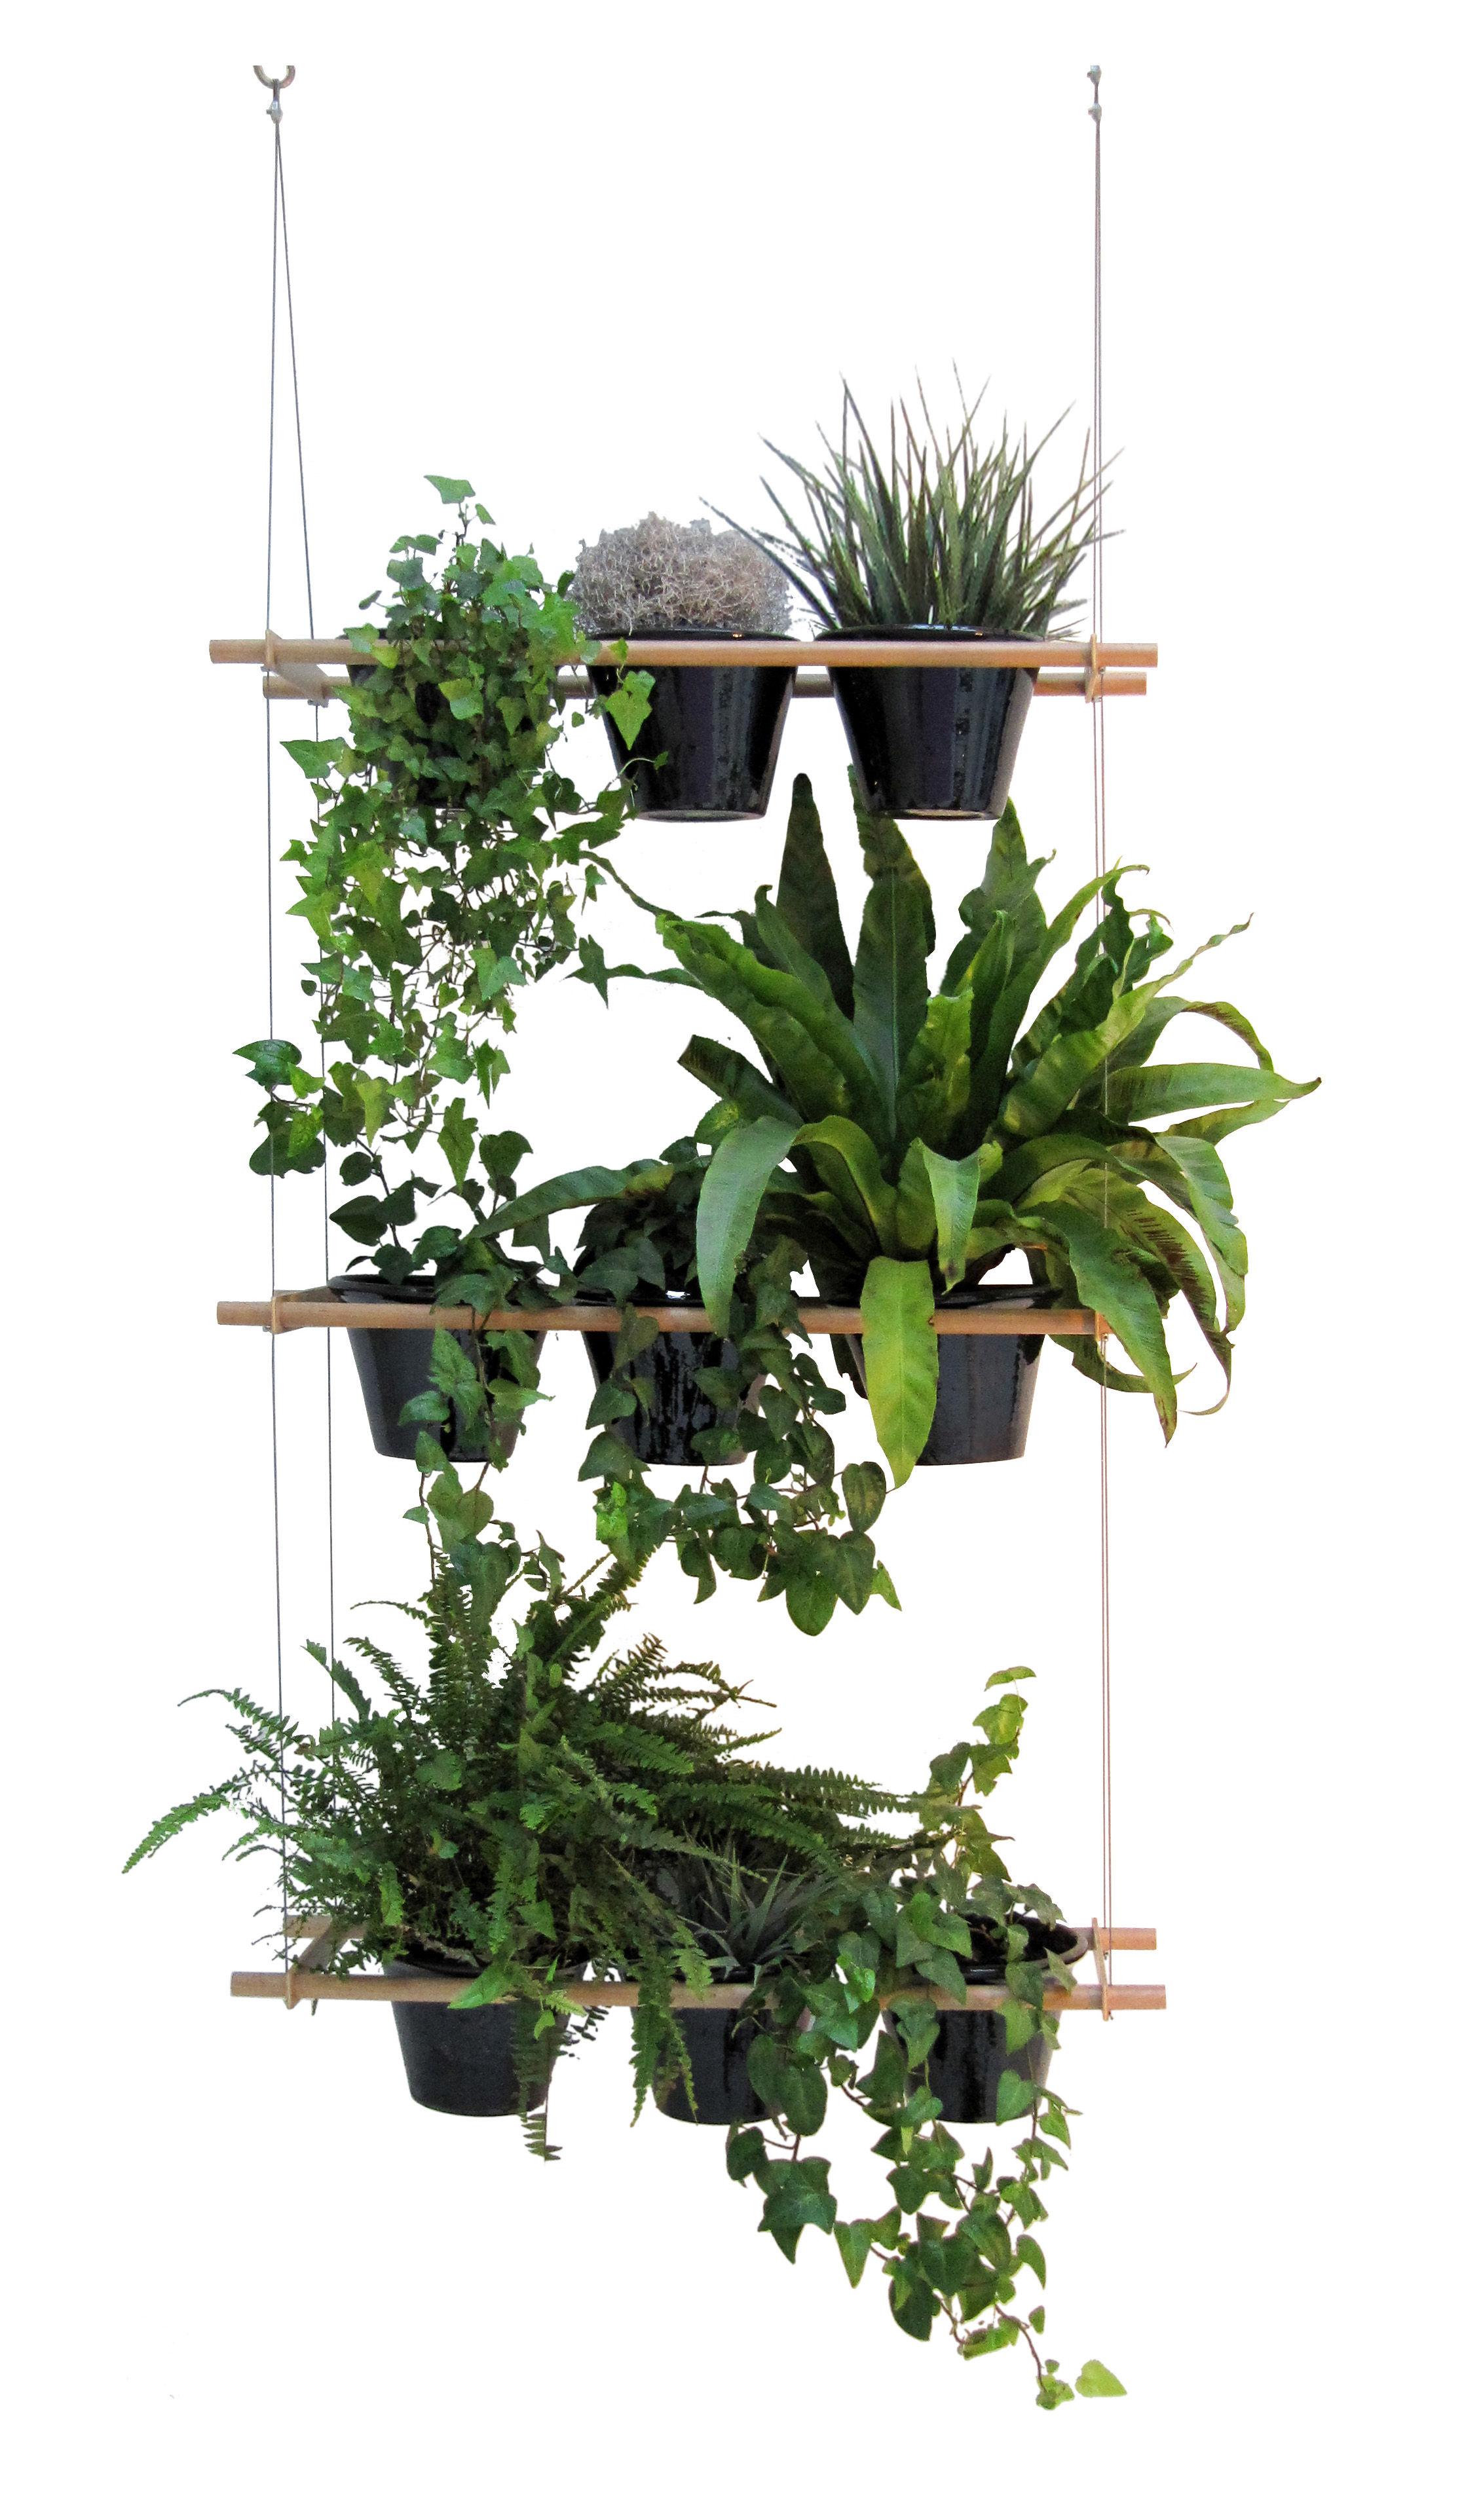 etcetera hanging flowerpot vegetal screen natural wood by compagnie made in design uk. Black Bedroom Furniture Sets. Home Design Ideas